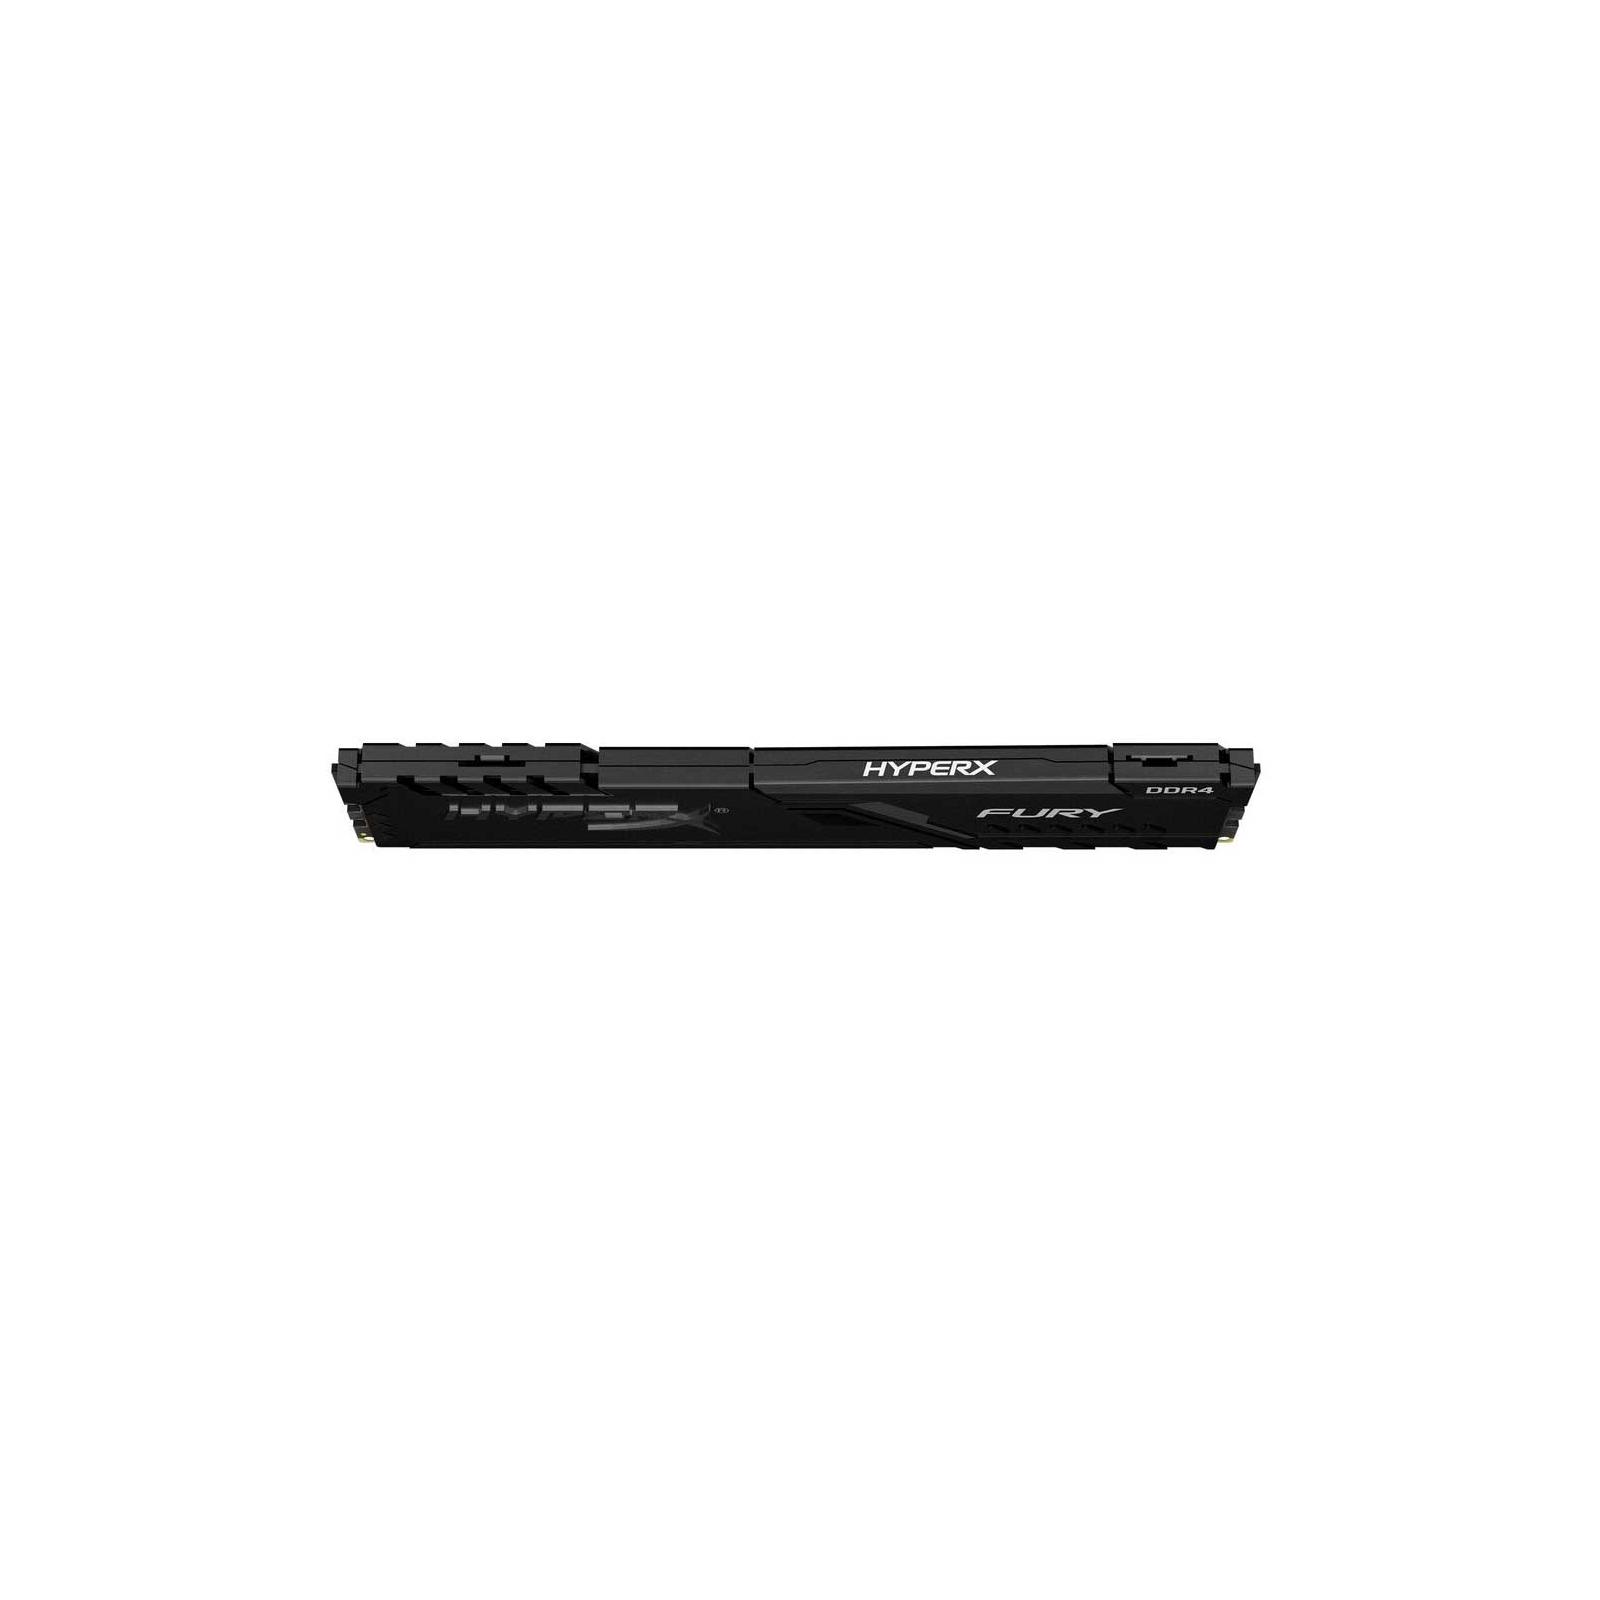 Модуль памяти для компьютера DDR4 16GB 2400 MHz HyperX FURY Black HyperX (Kingston Fury) (HX424C15FB3/16) изображение 4